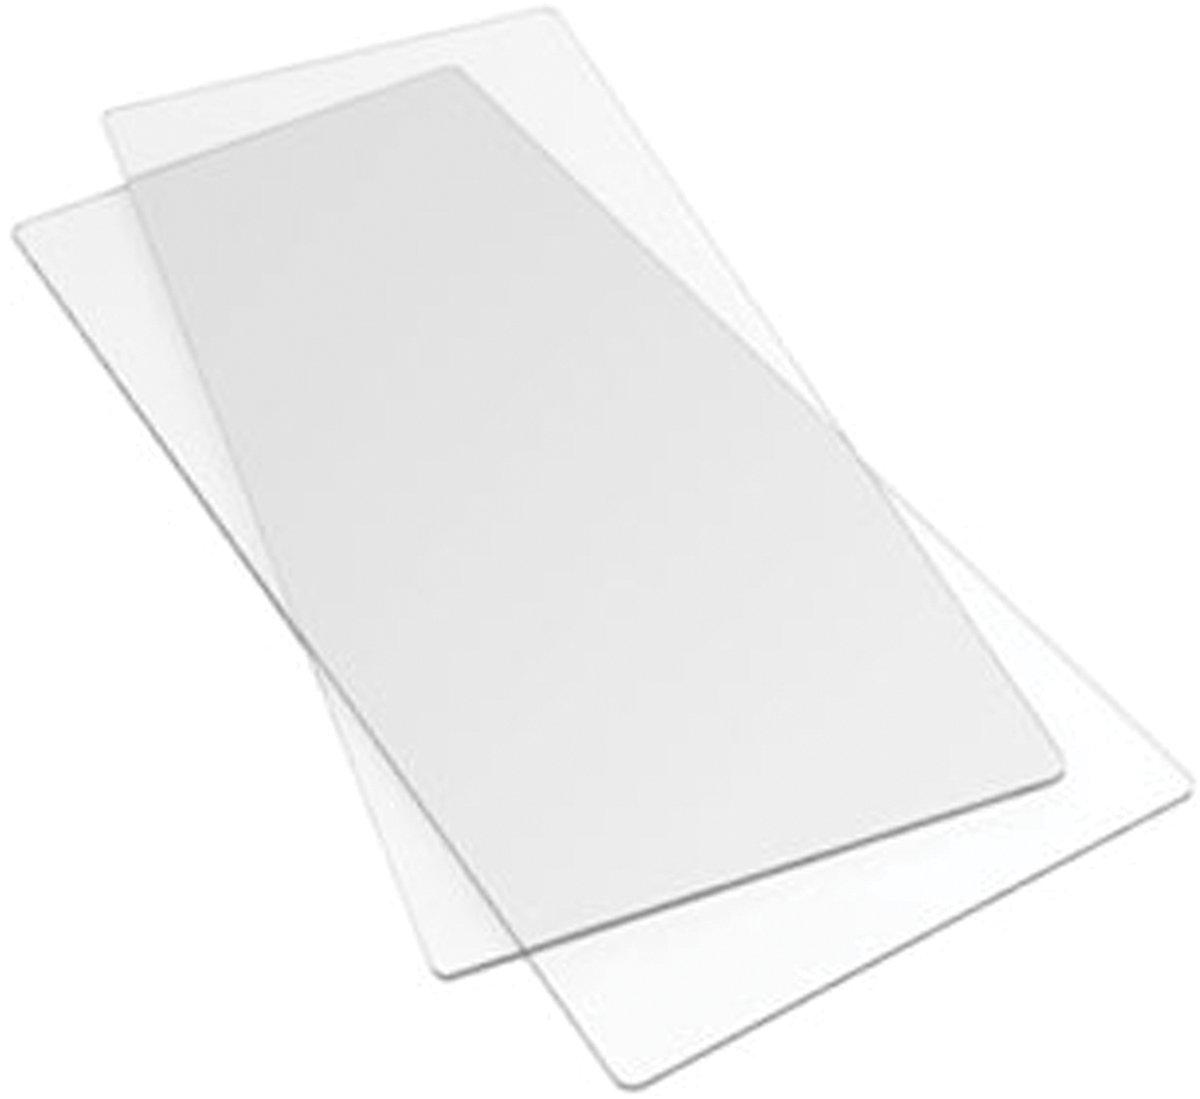 Sizzix Accessory - Cutting Pads, Bigz XL 25'', 1 Pair